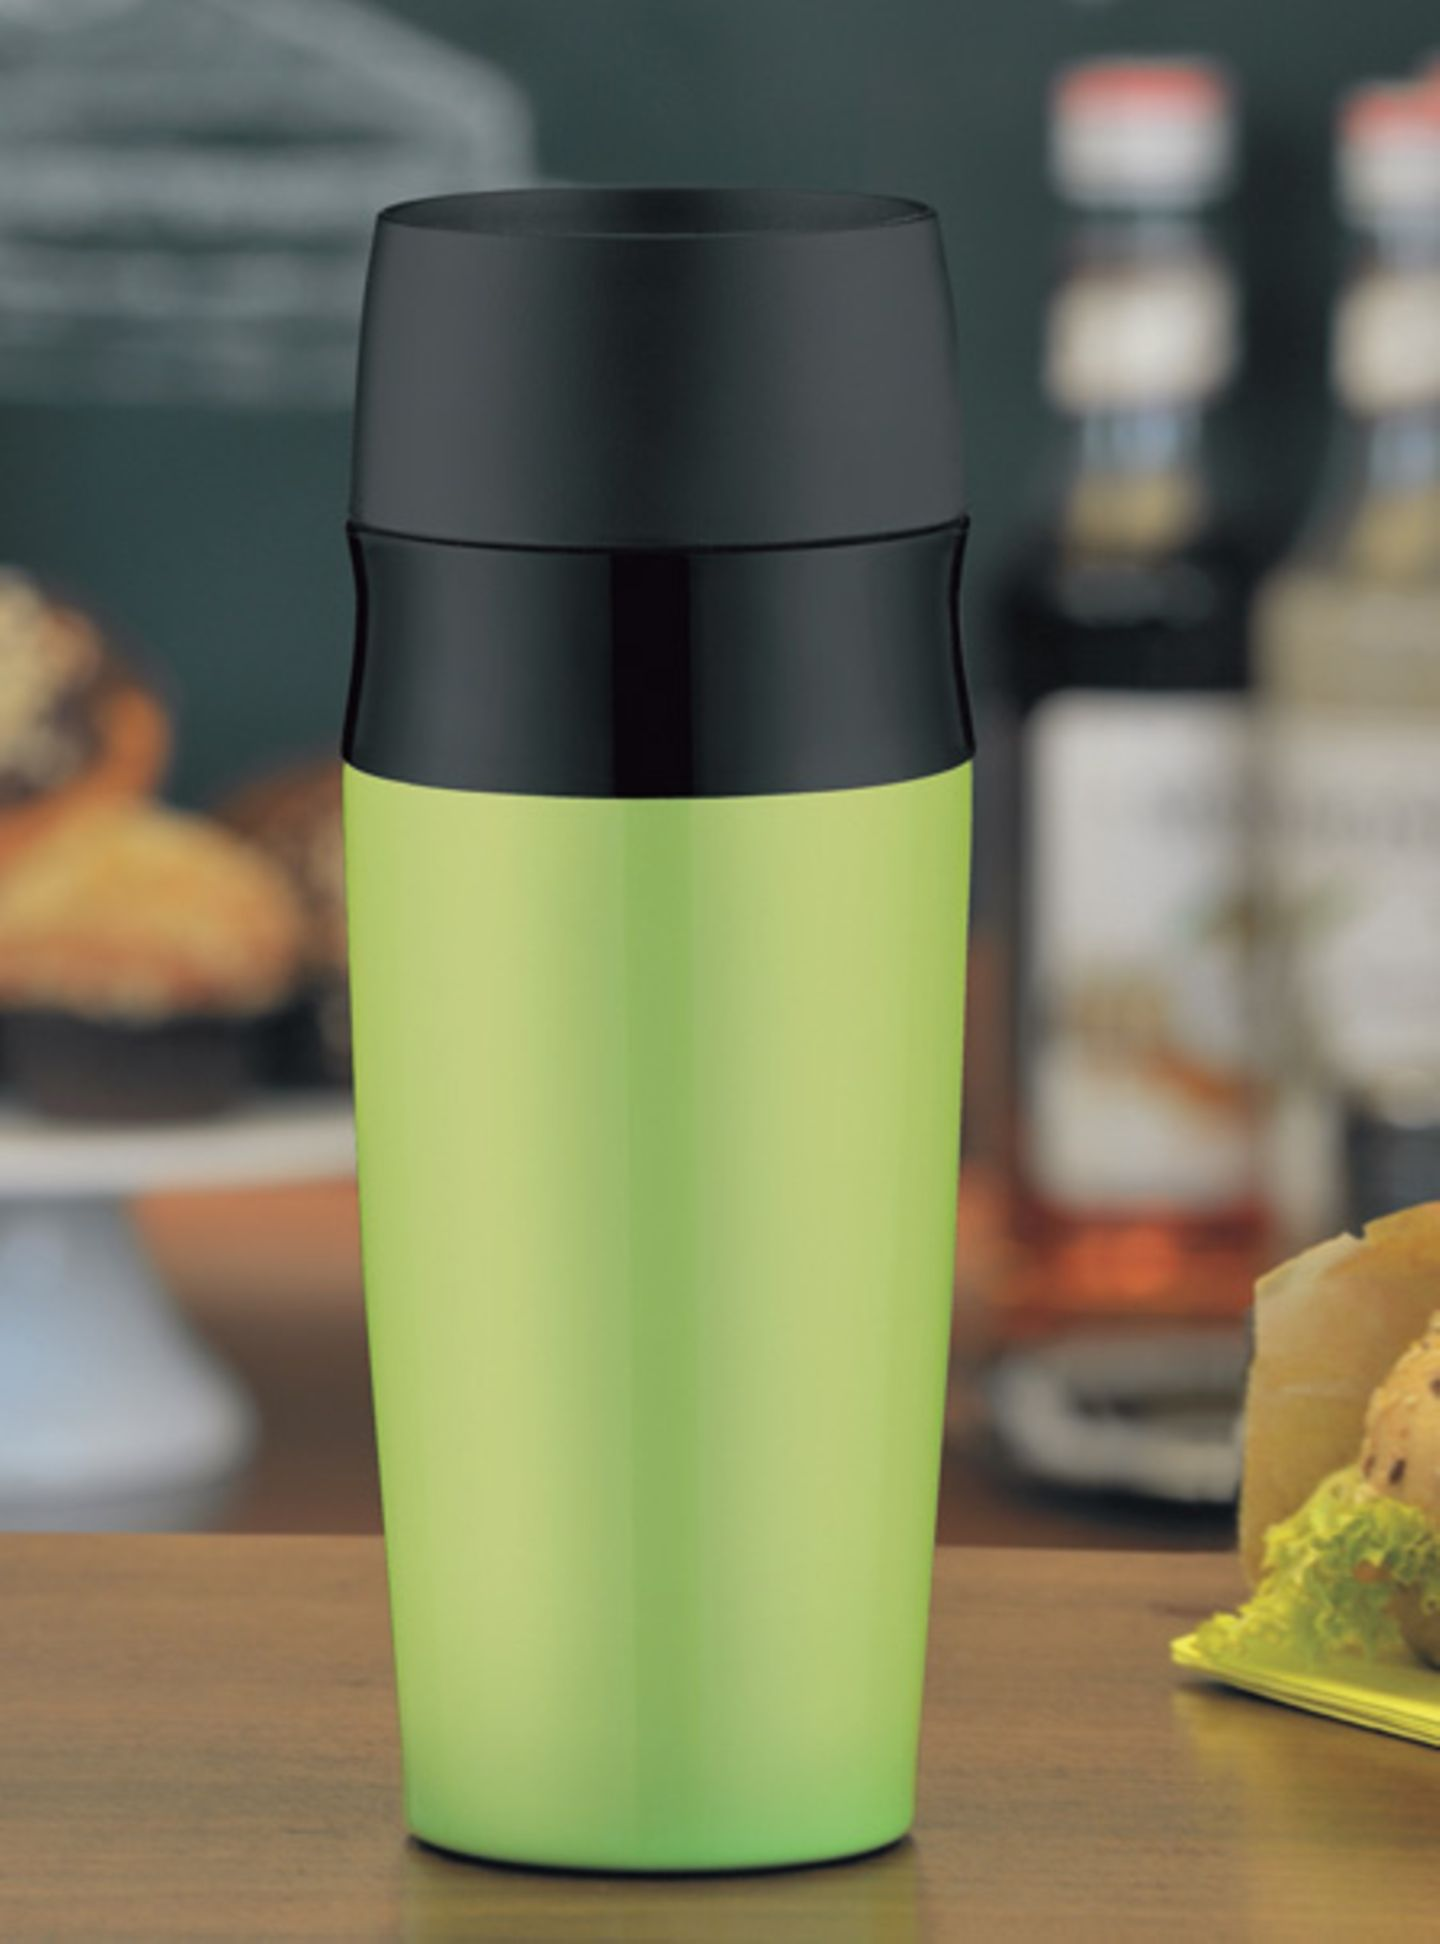 Apfelgrünes Kaffeevergnügen: travel Mug von alfi